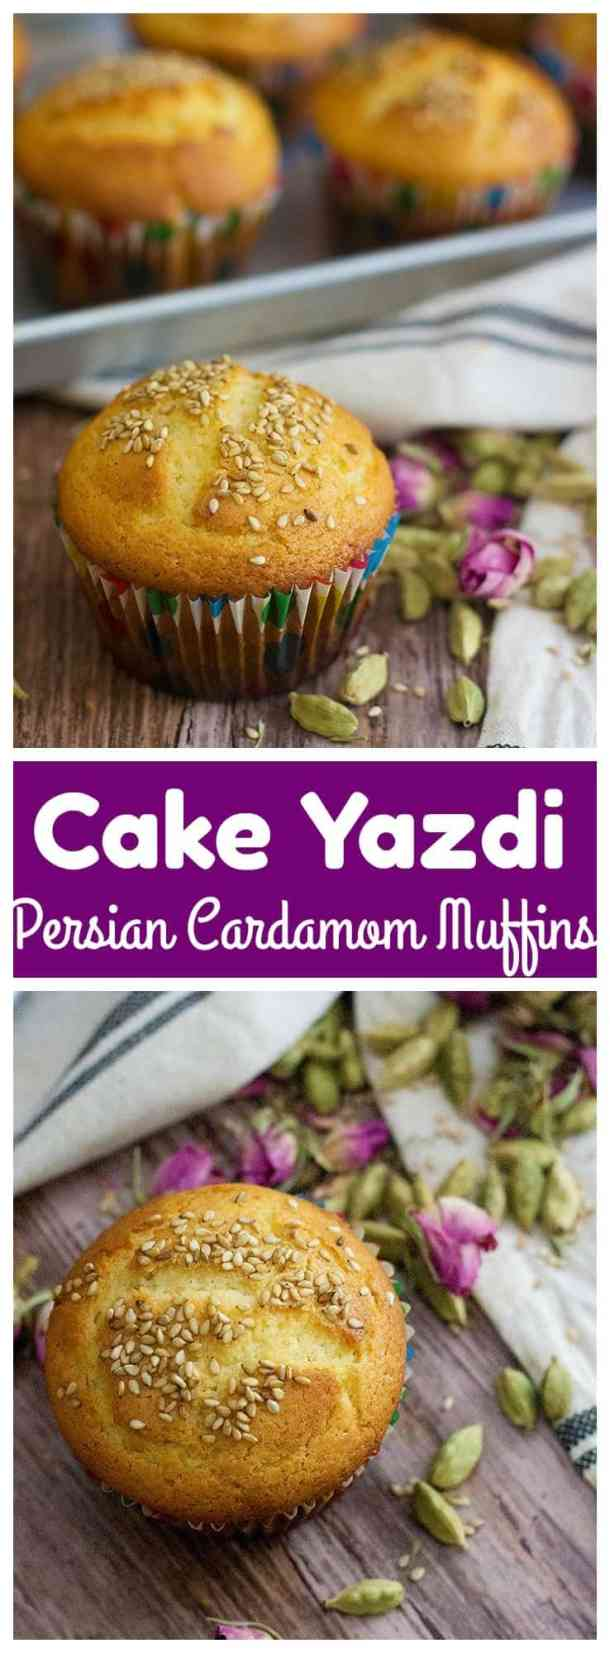 Cake Yazdi Recipe